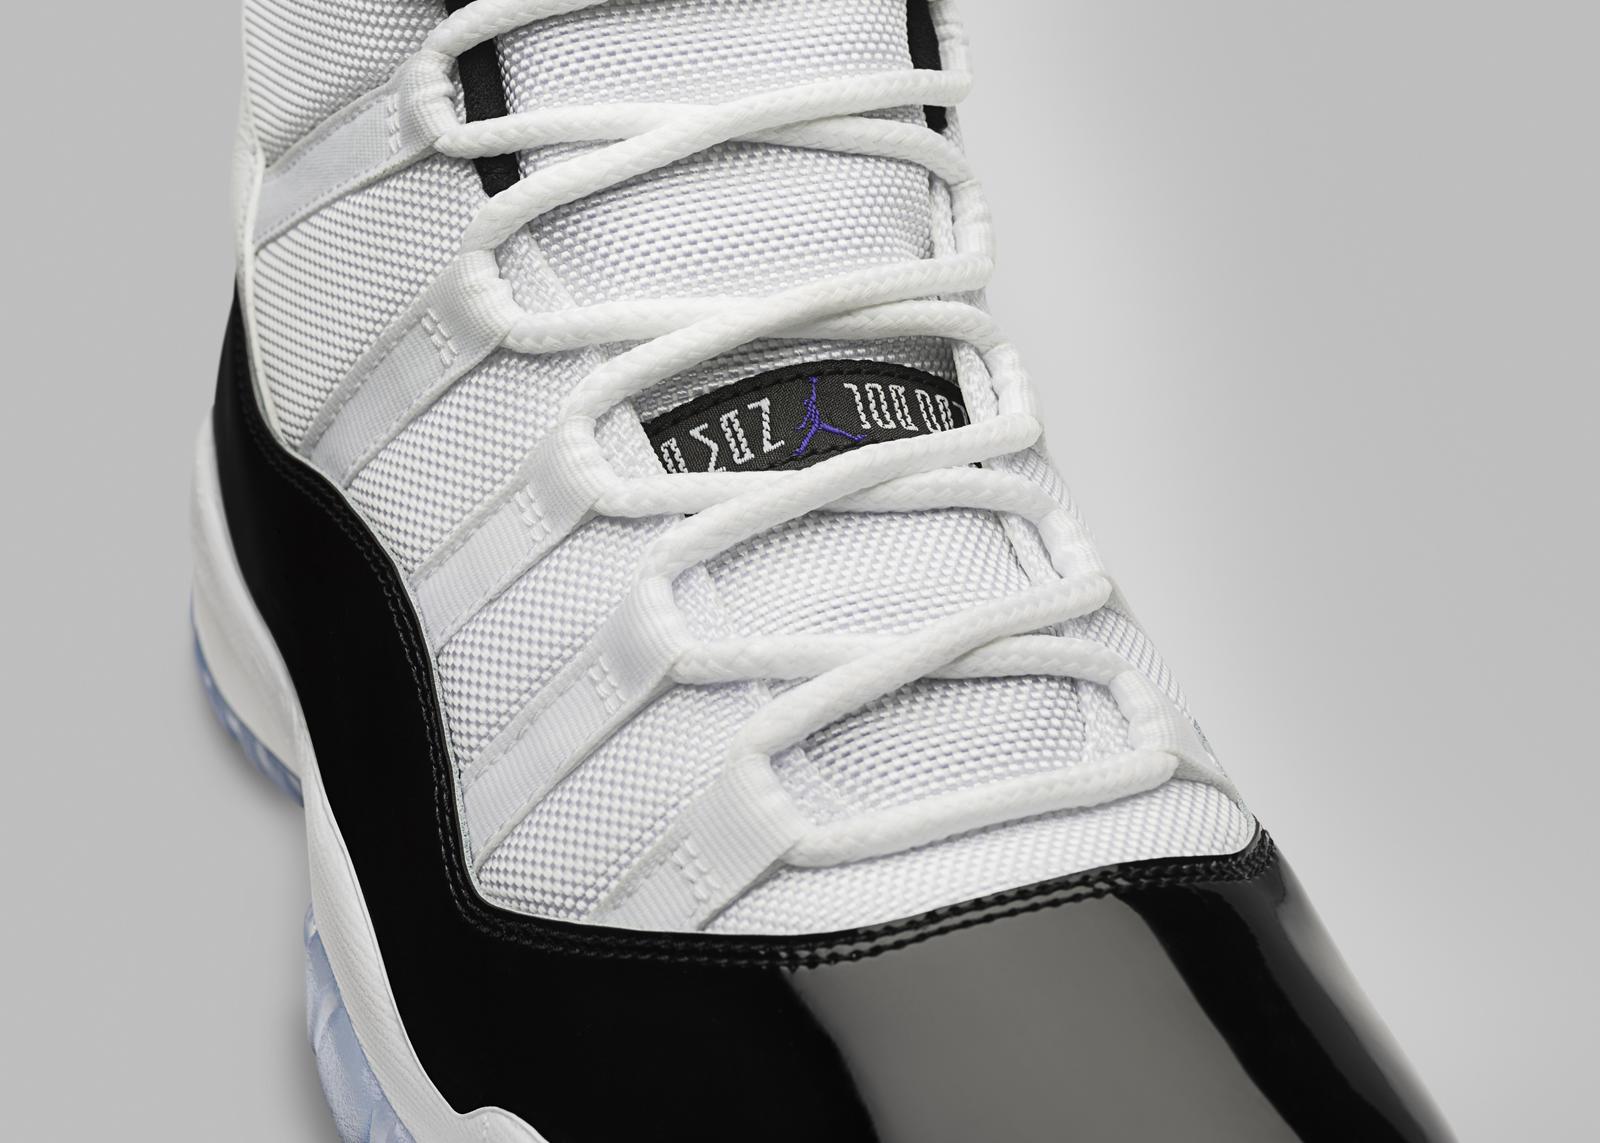 best sneakers 5feb7 eba6b The highly anticipated Air Jordan 11